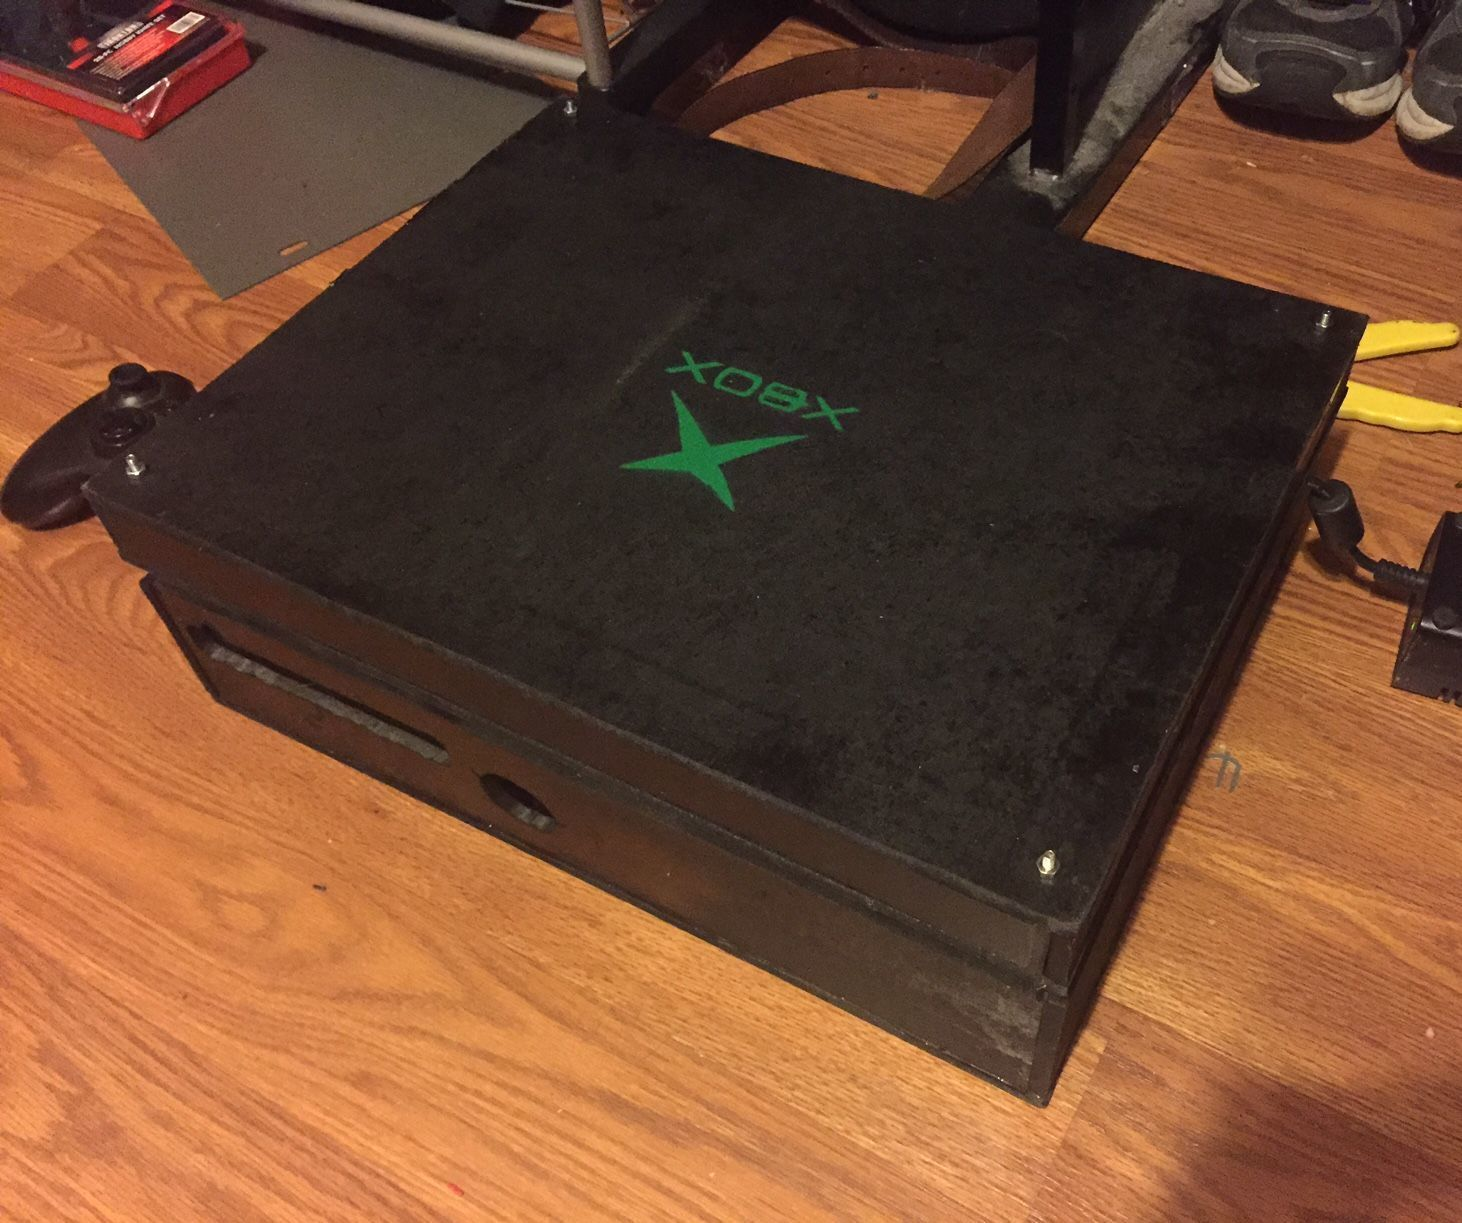 Portable Xbox 360 slim